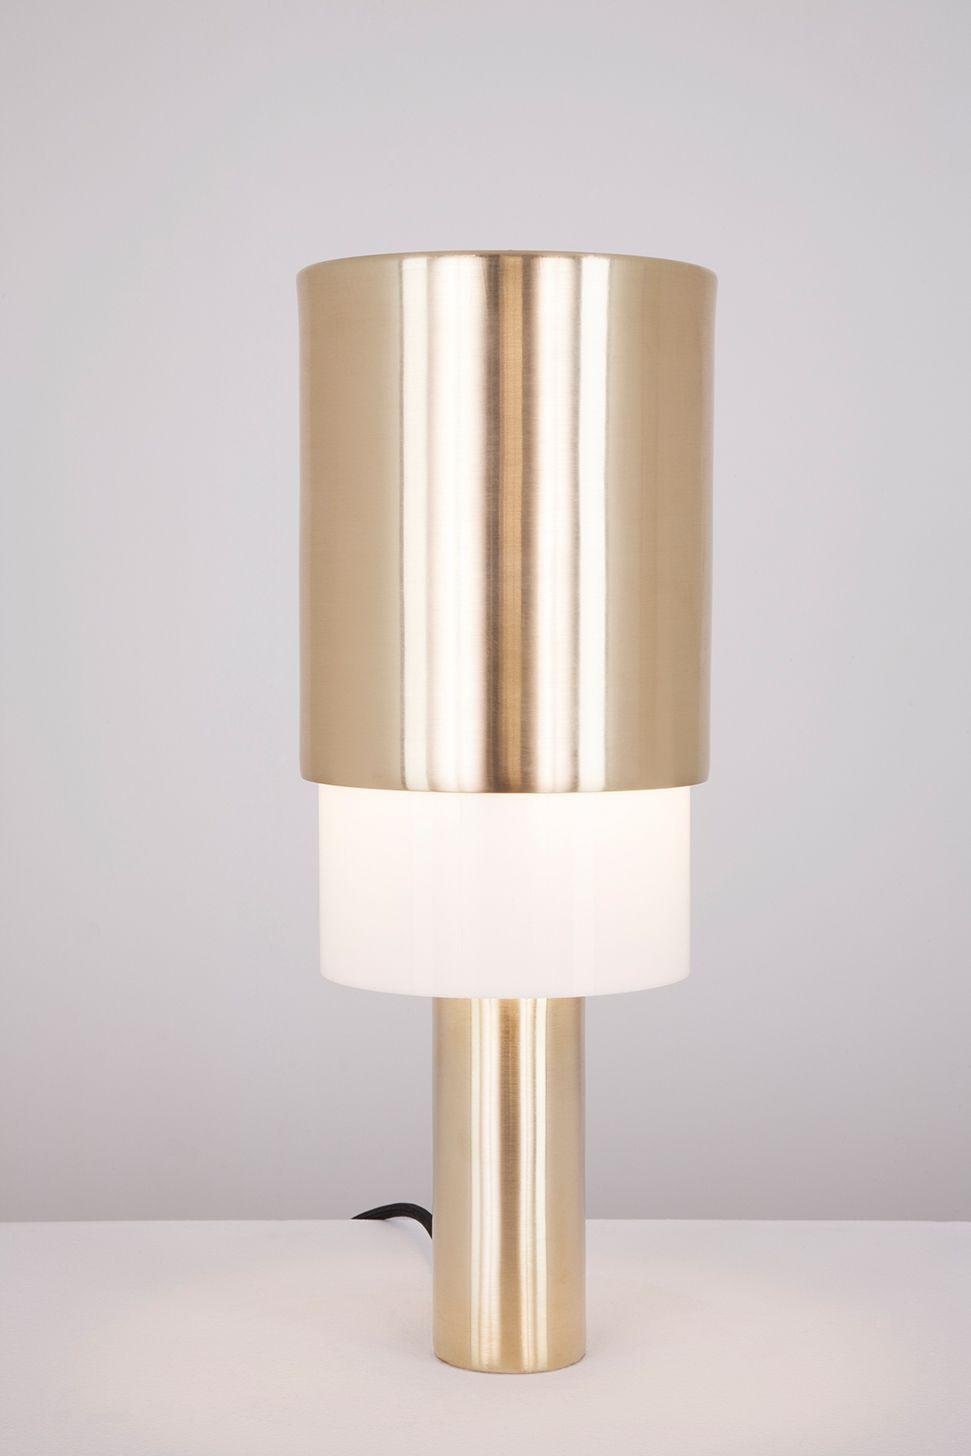 Totem Lamp Atelier De Troupe In 2020 Lamp Floor Lamp Cool Chandeliers